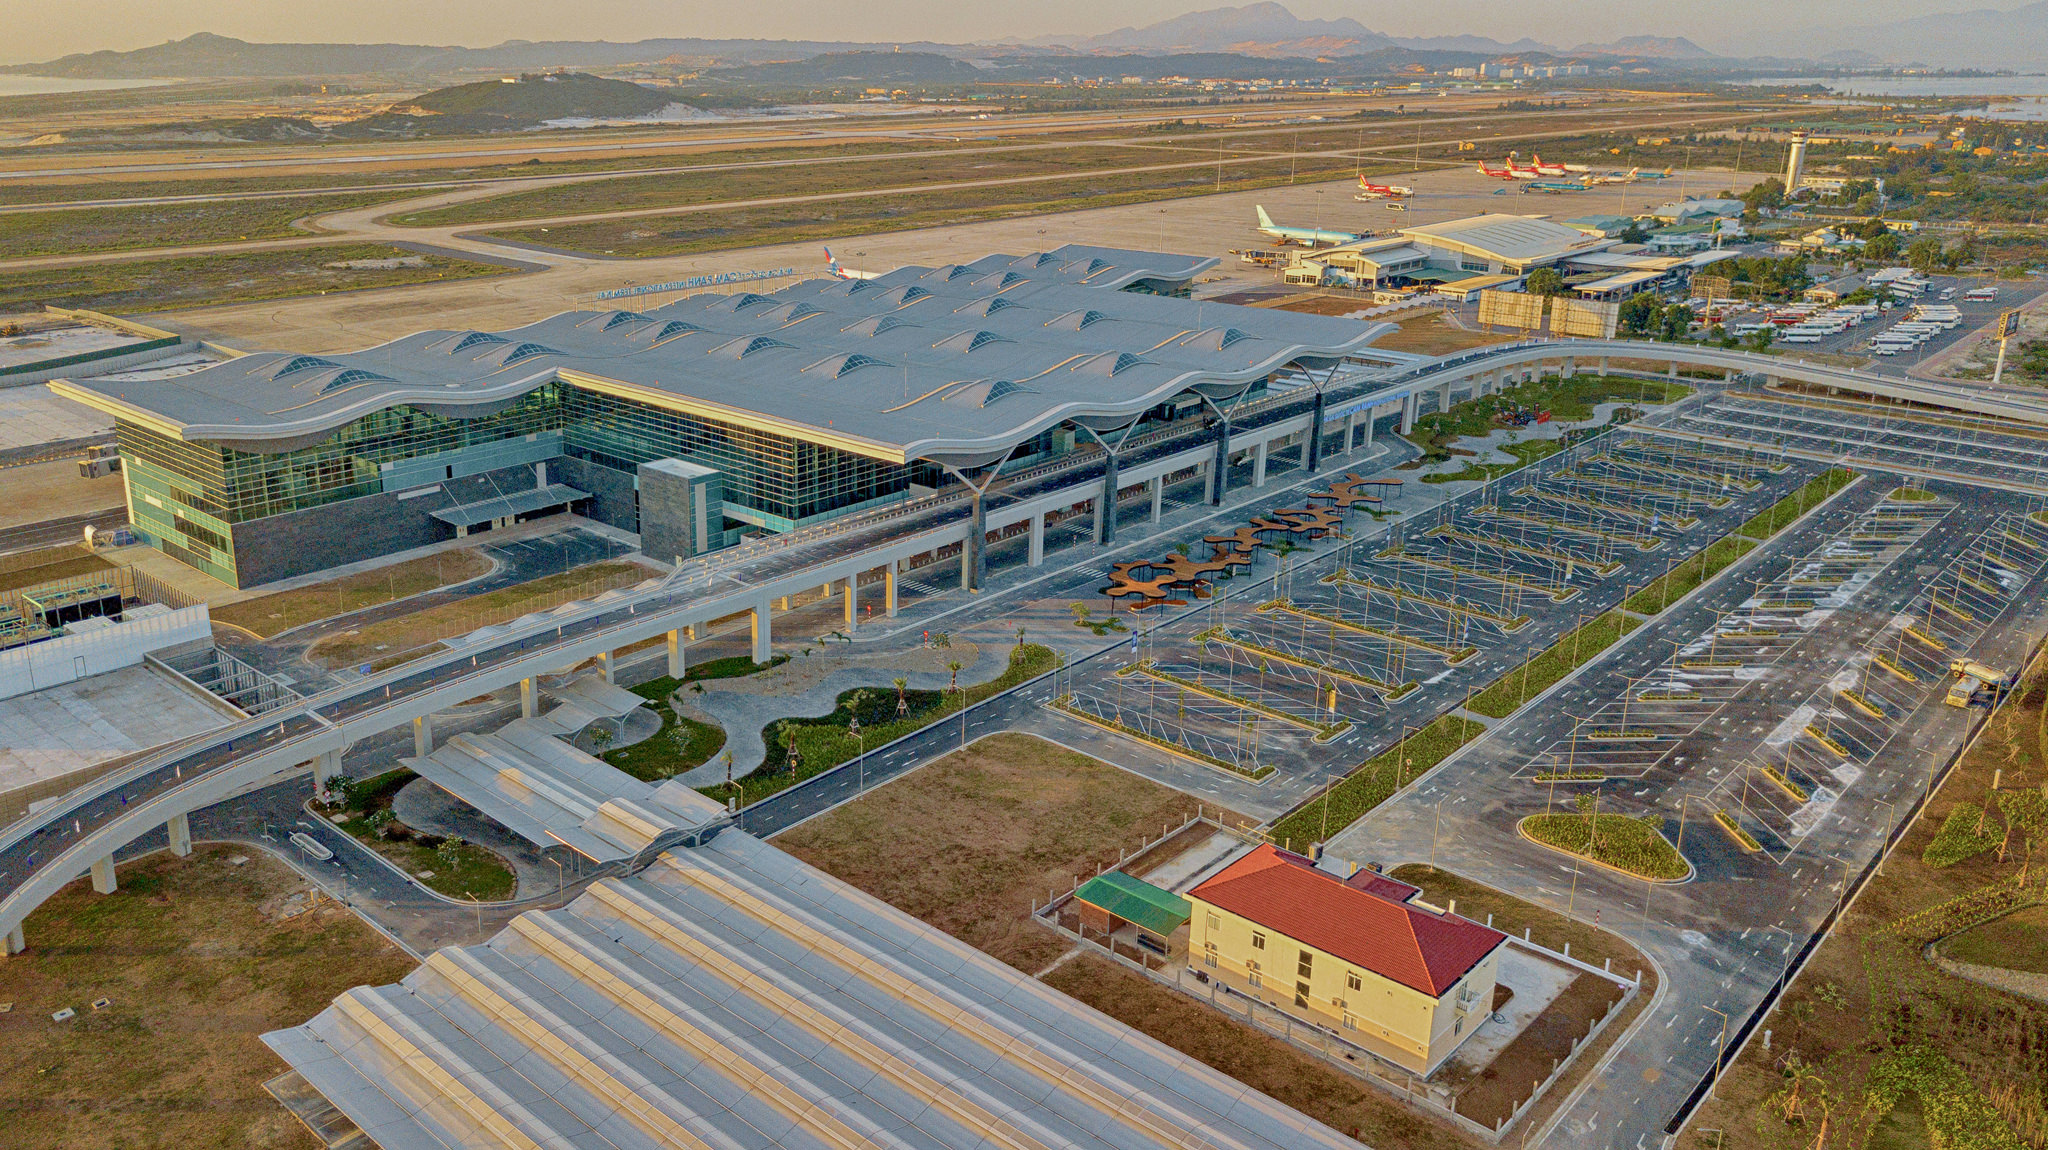 20180626 - Cam Ranh Airport - Architecture - Flycam - 0012.jpg